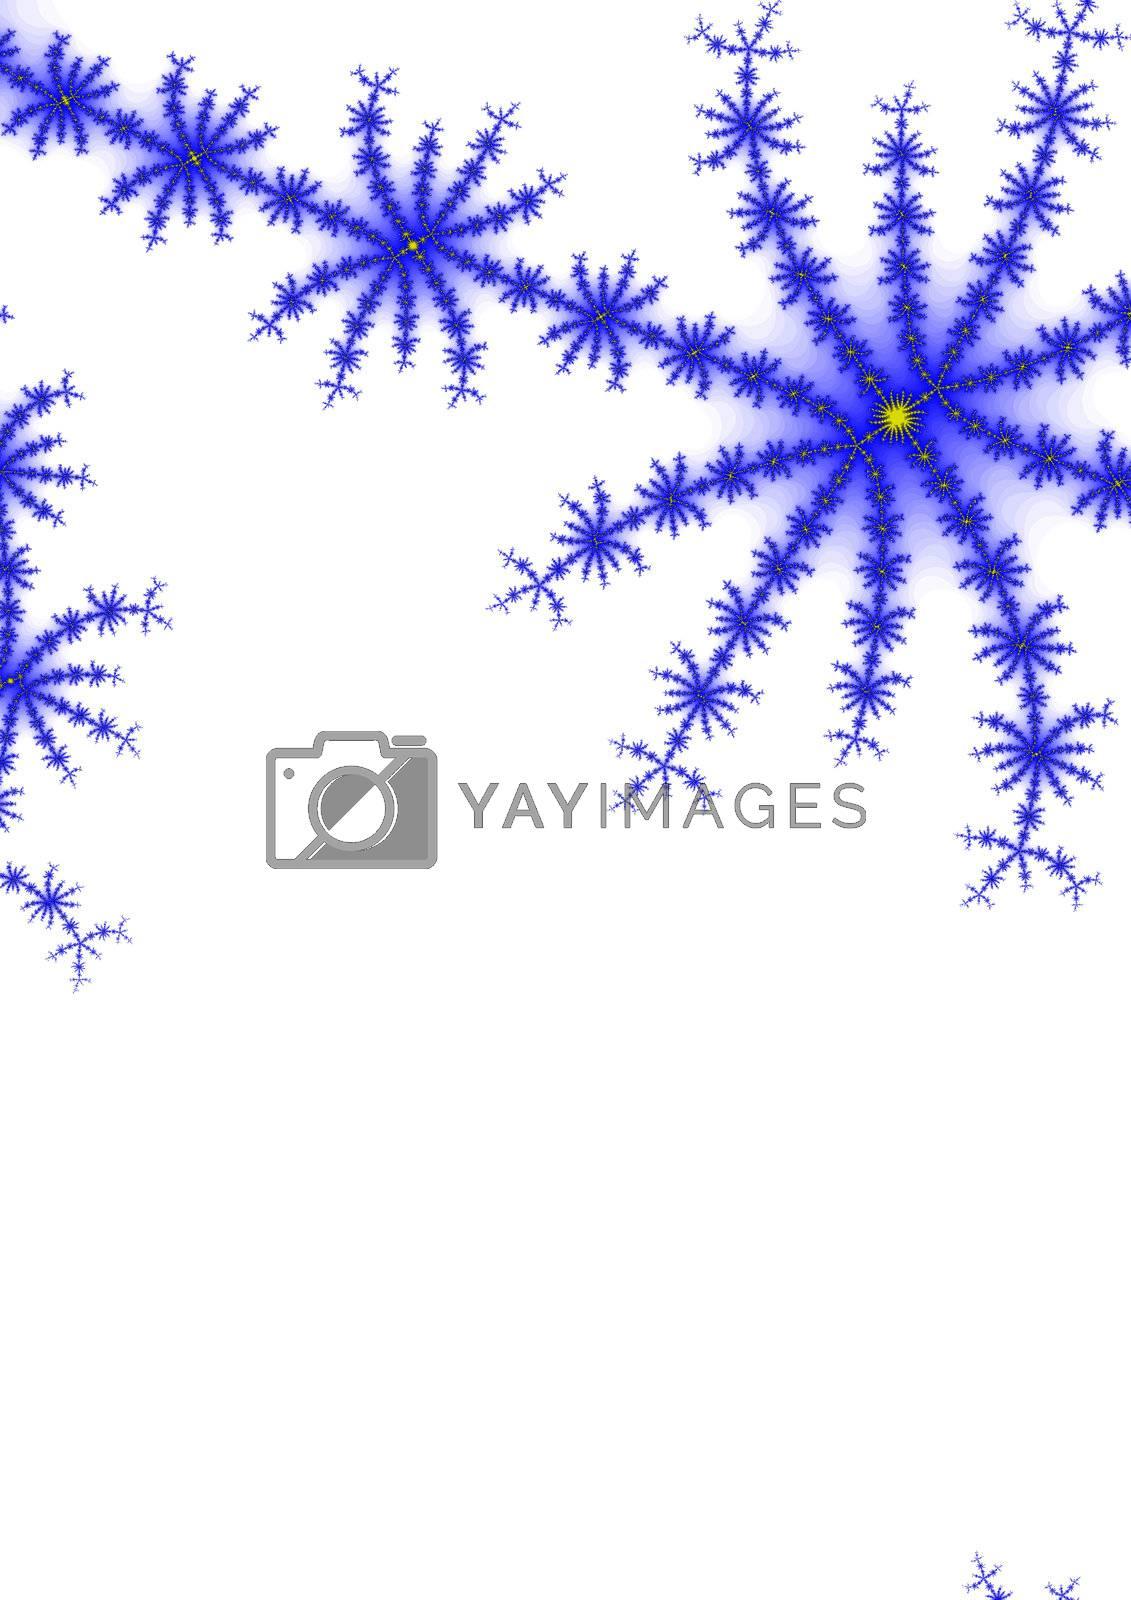 A fractal representation of snowfla